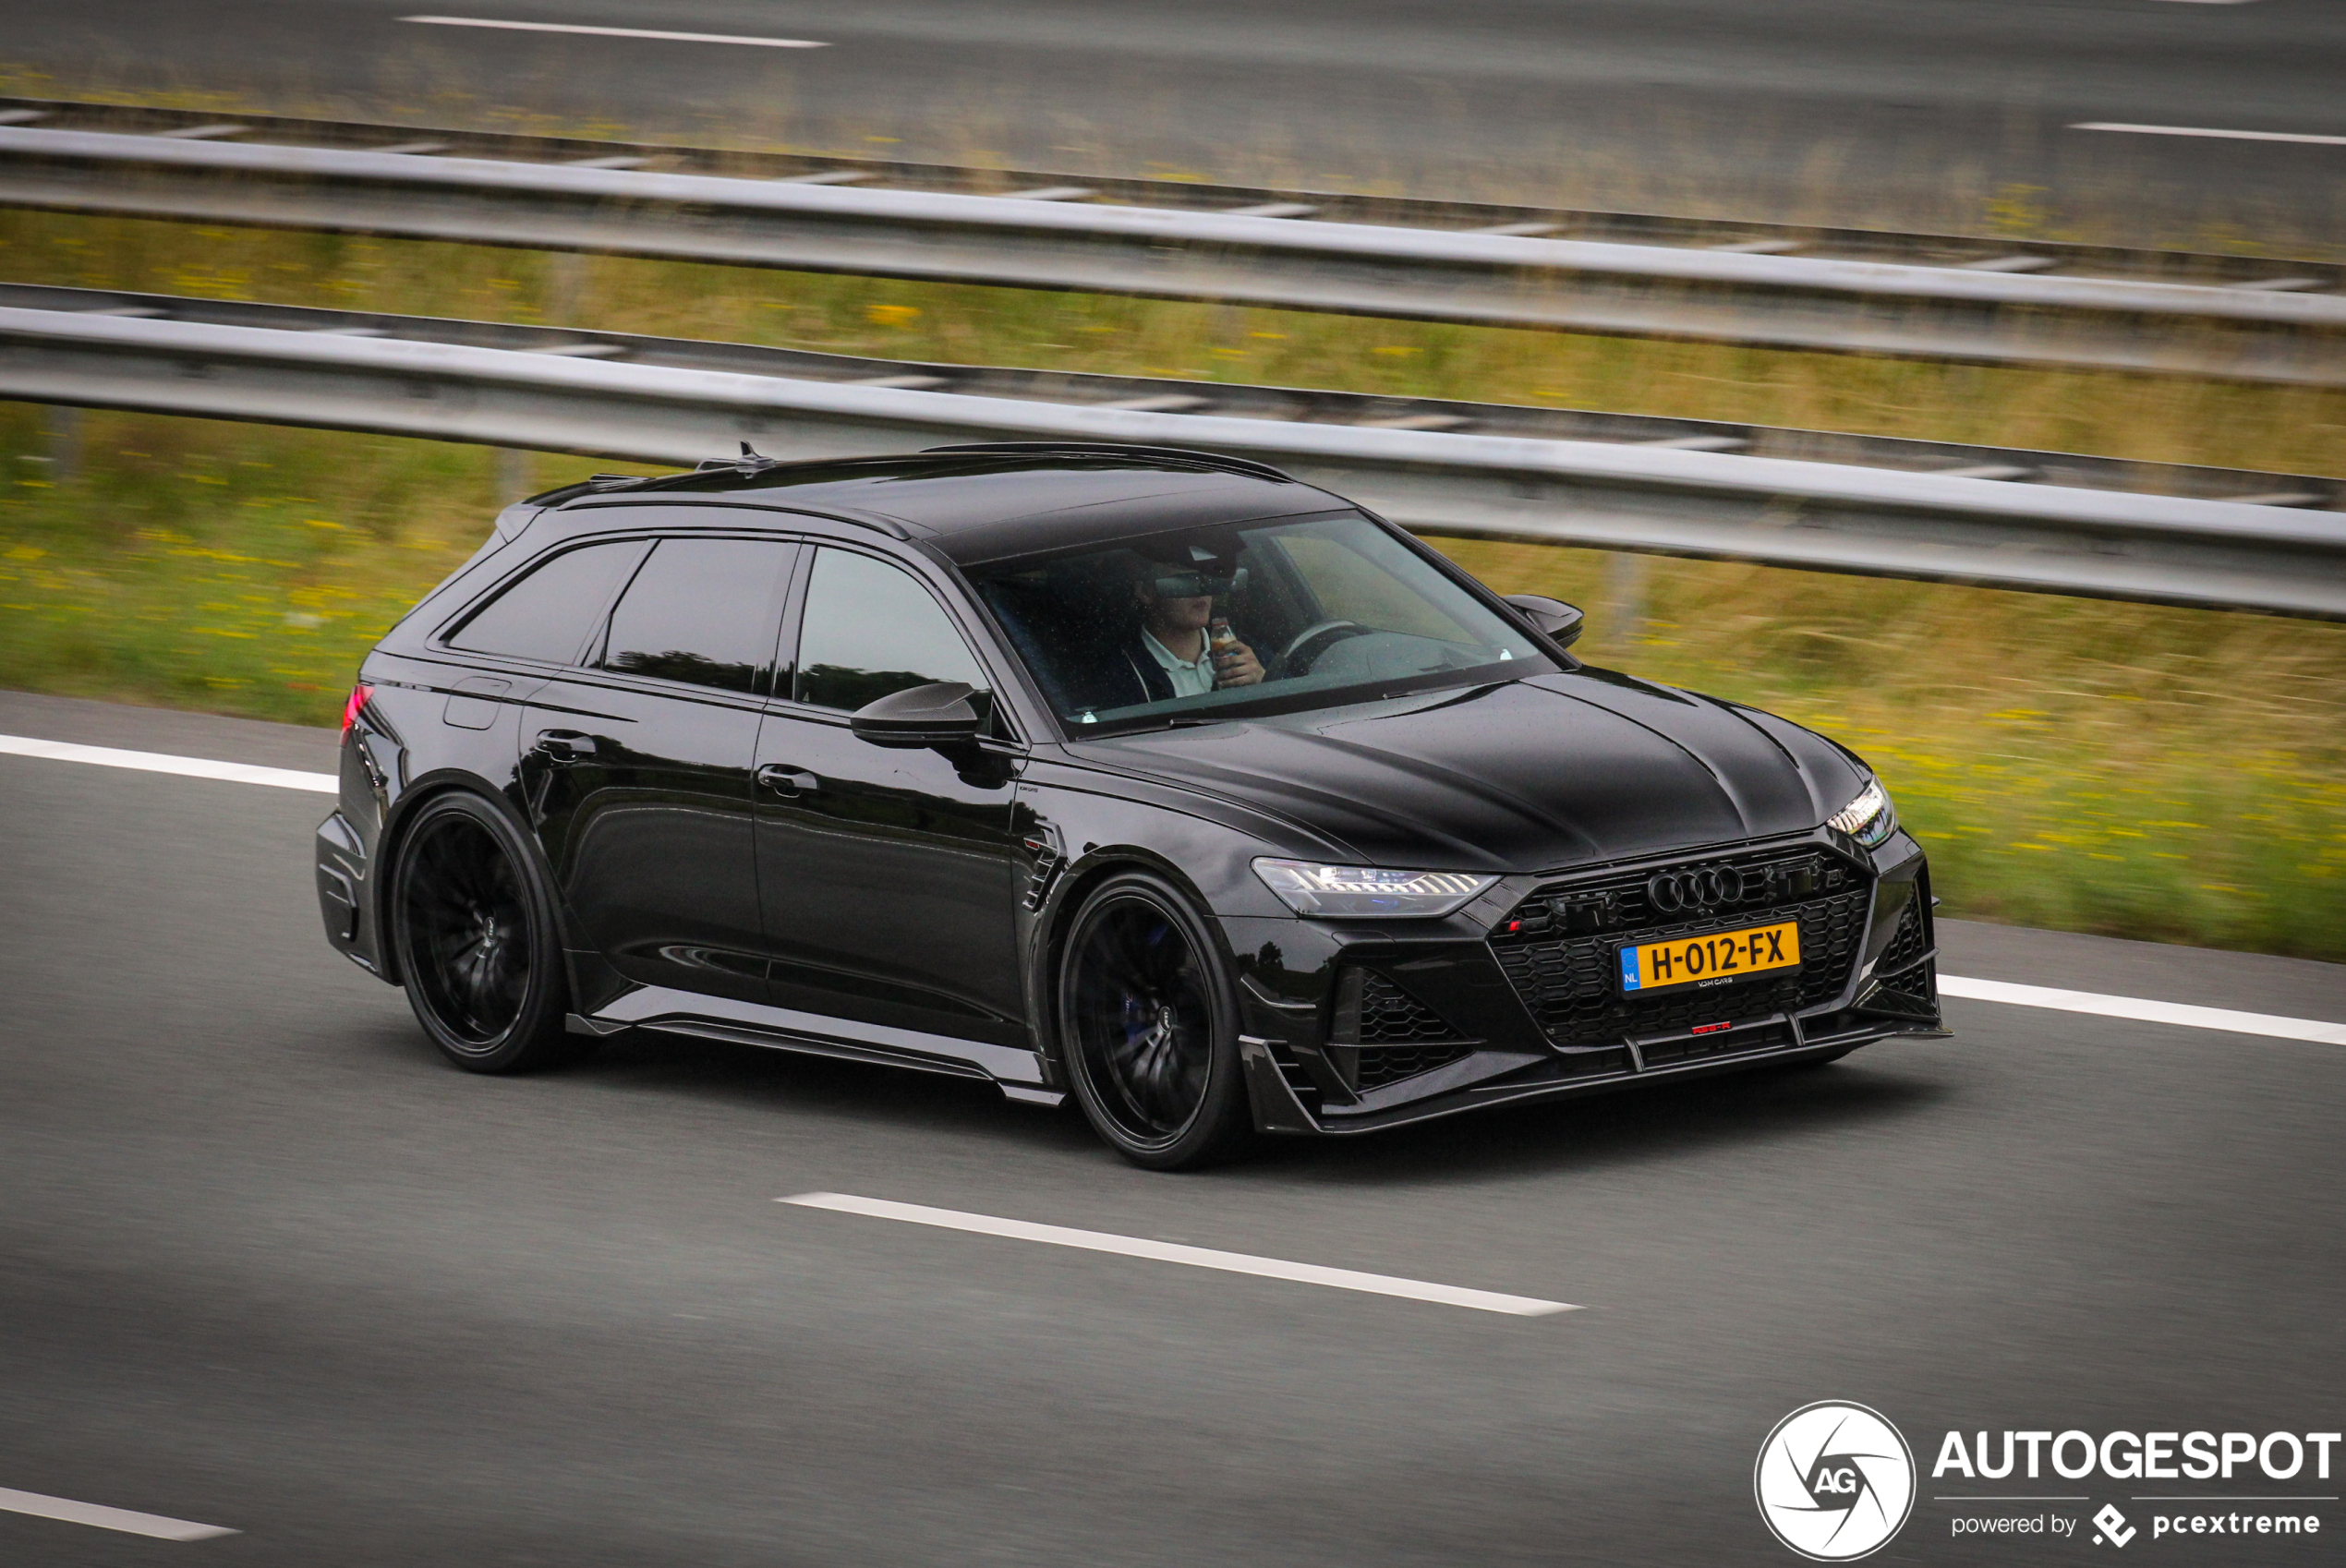 Is dit de Audi ABT RS6-R Avant van Hakim Ziyech?